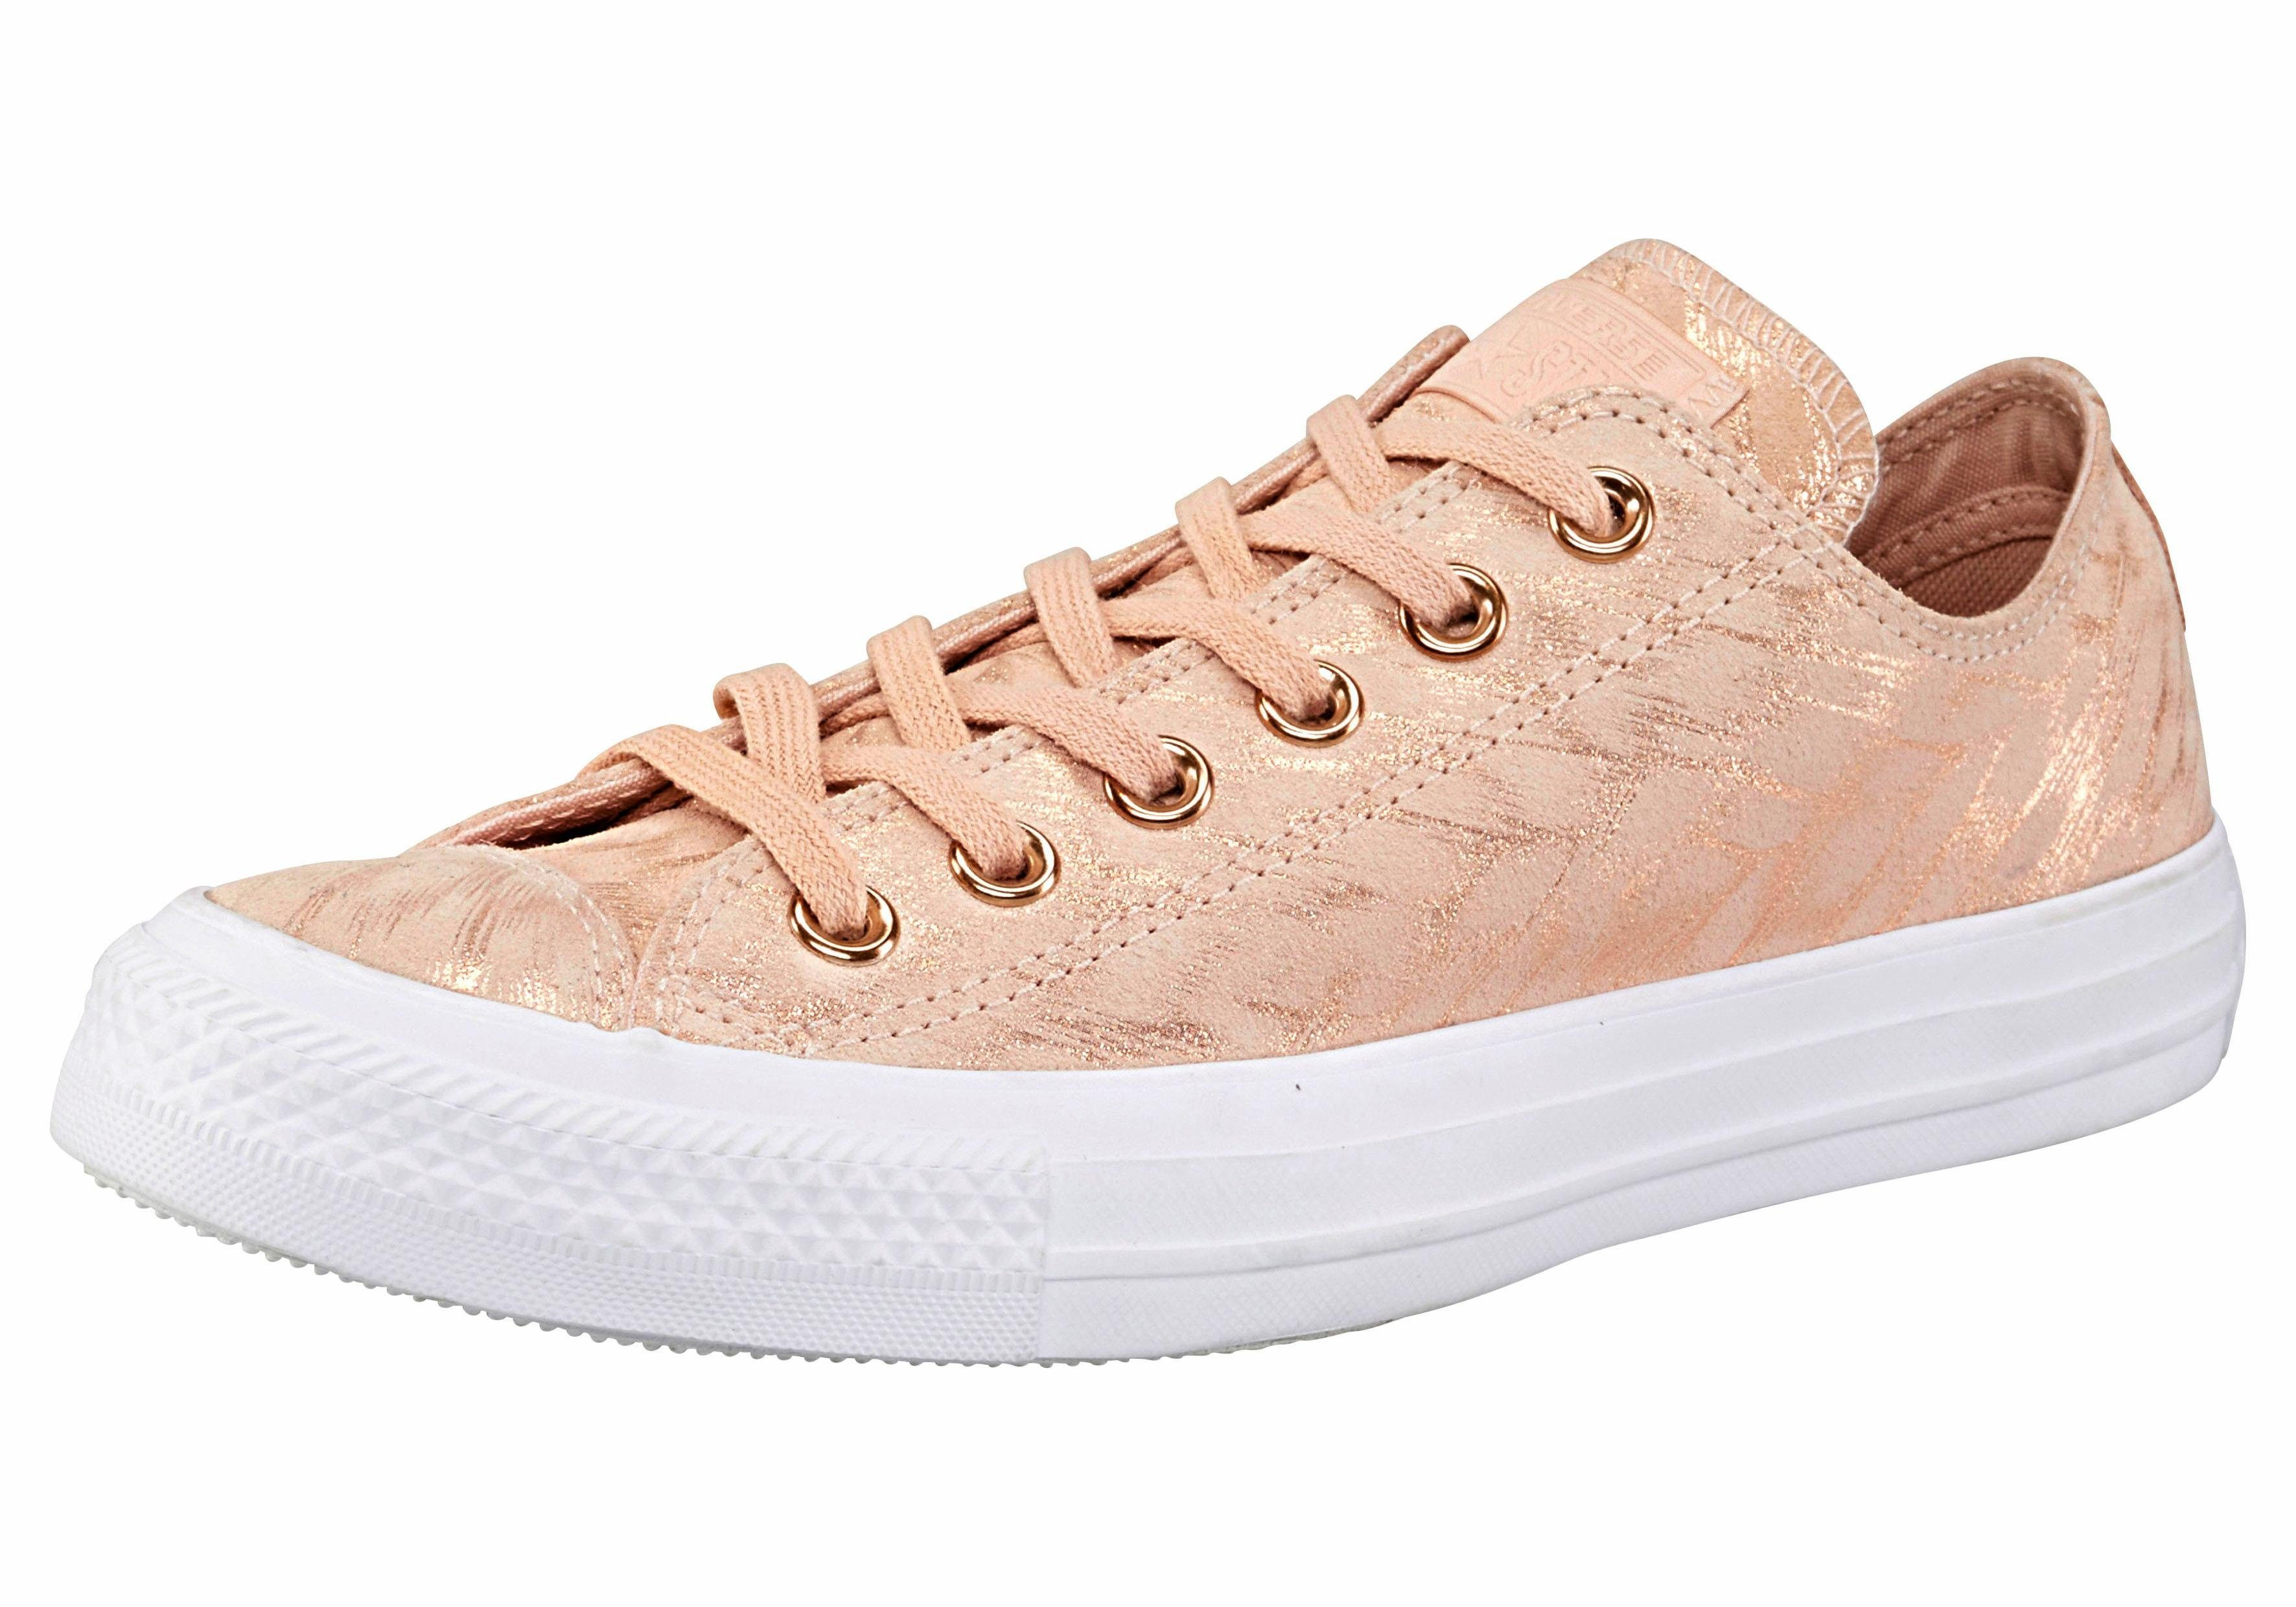 Converse Chuck Taylor All Star Ox Sneaker, Shimmer Suede online kaufen  roségoldfarben